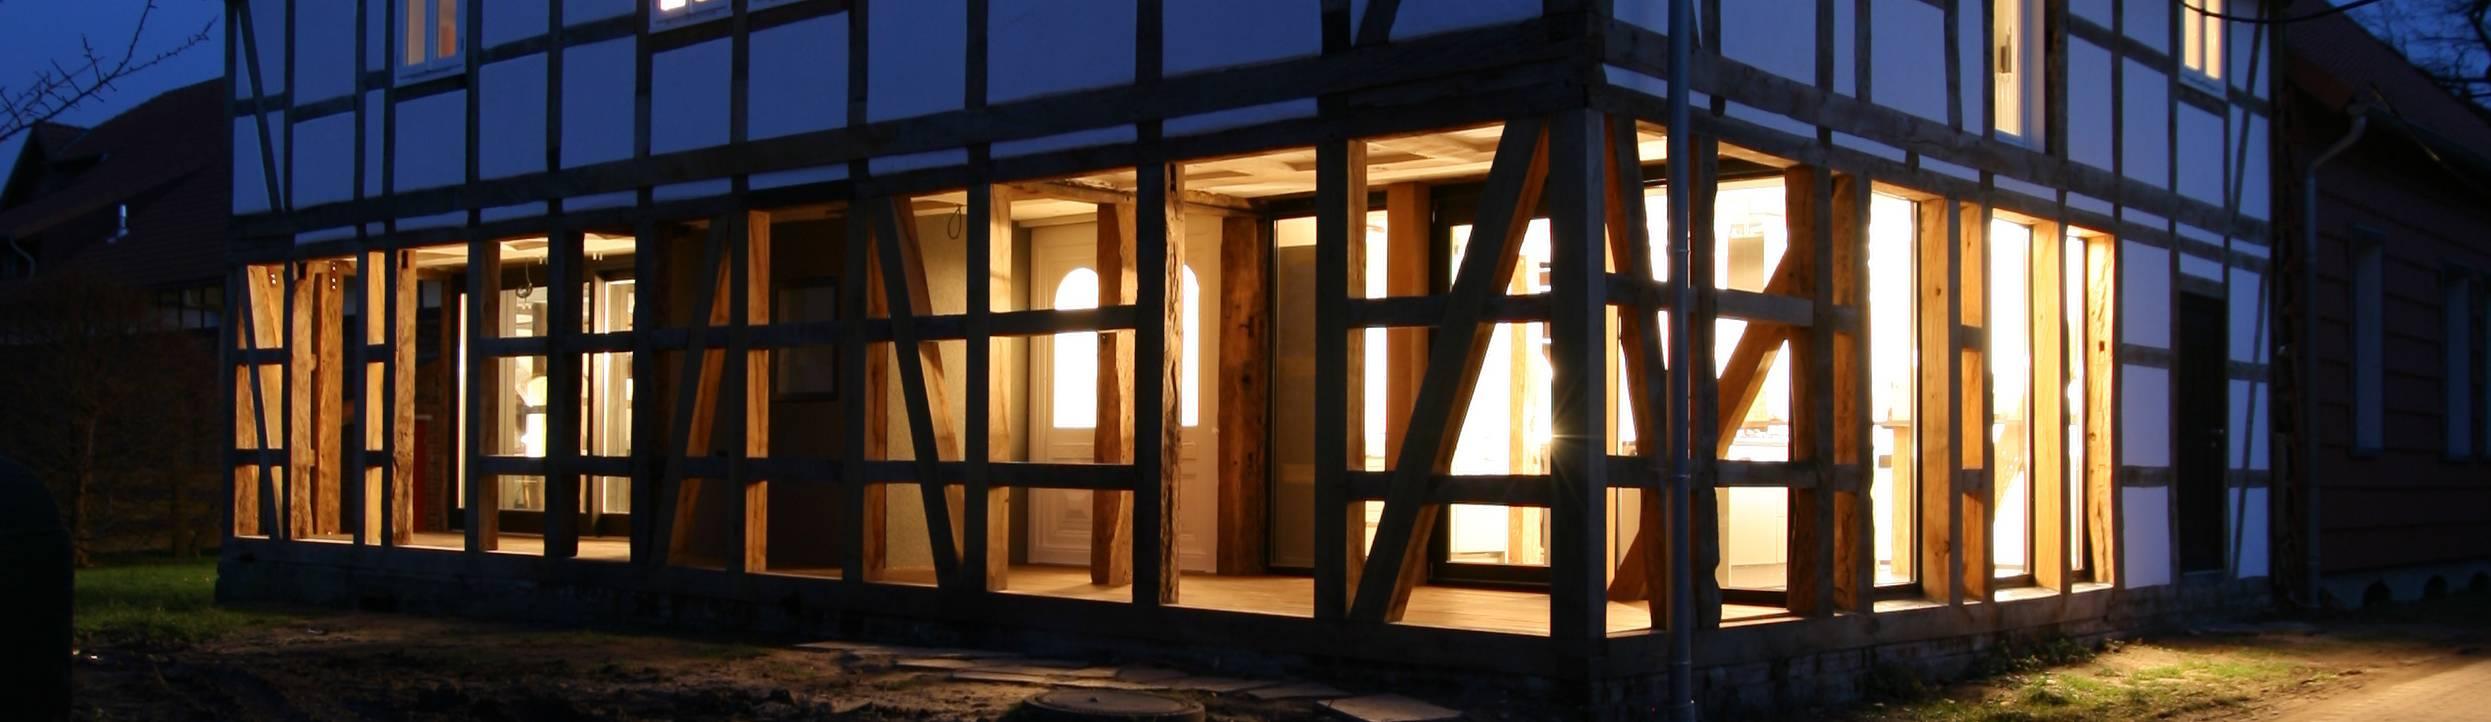 Despang Architekten